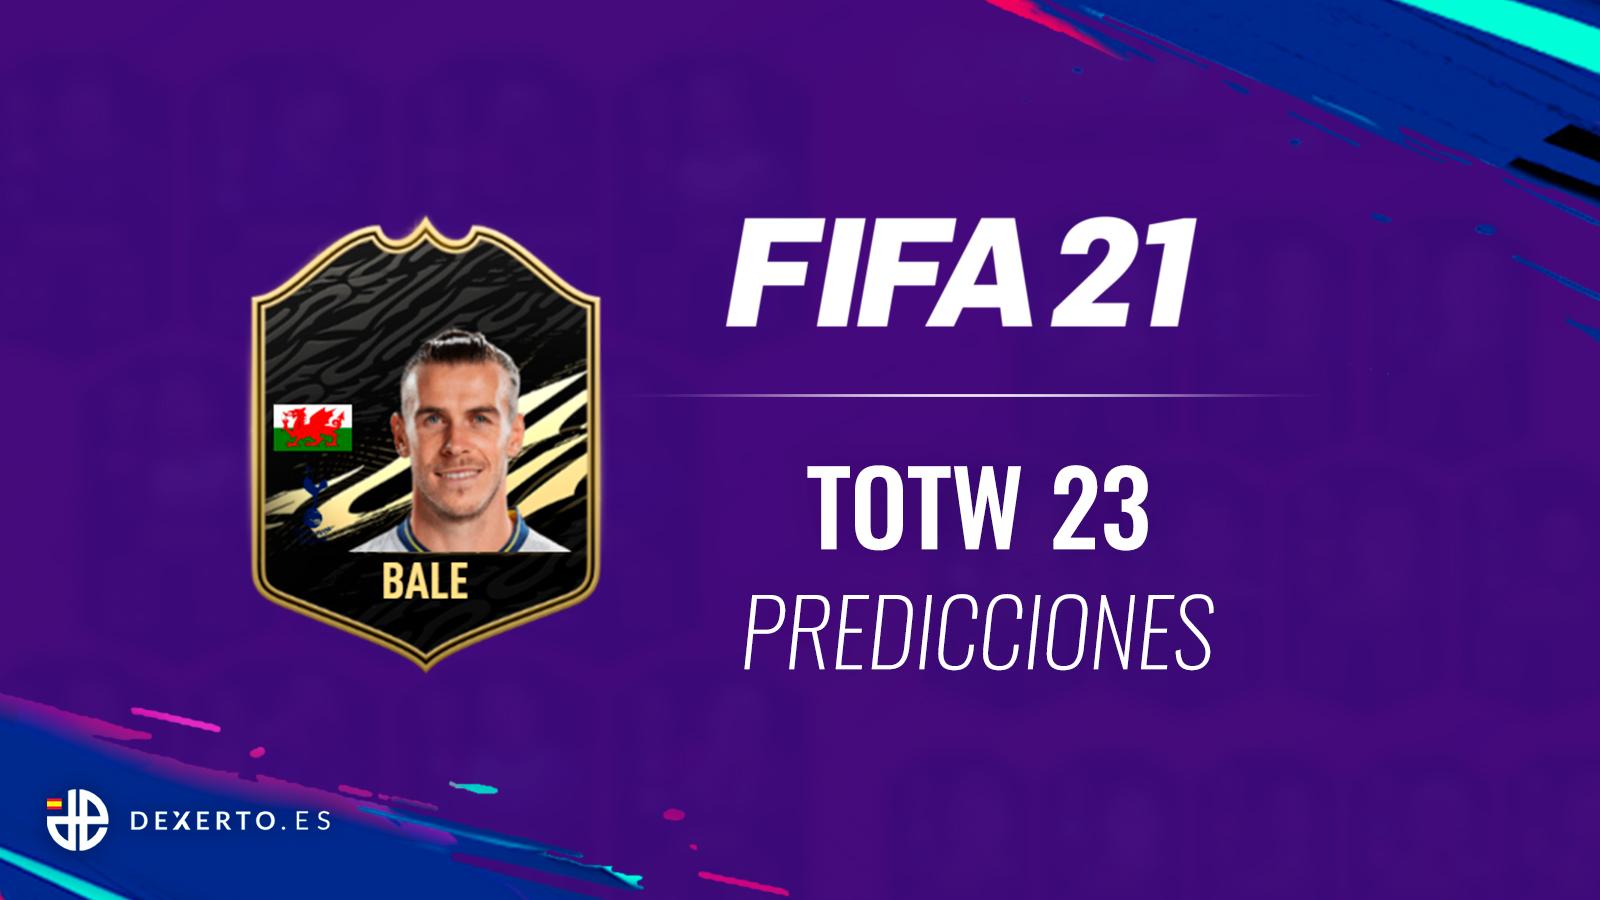 FIFA 21 TOTW 23 predicciones Bale